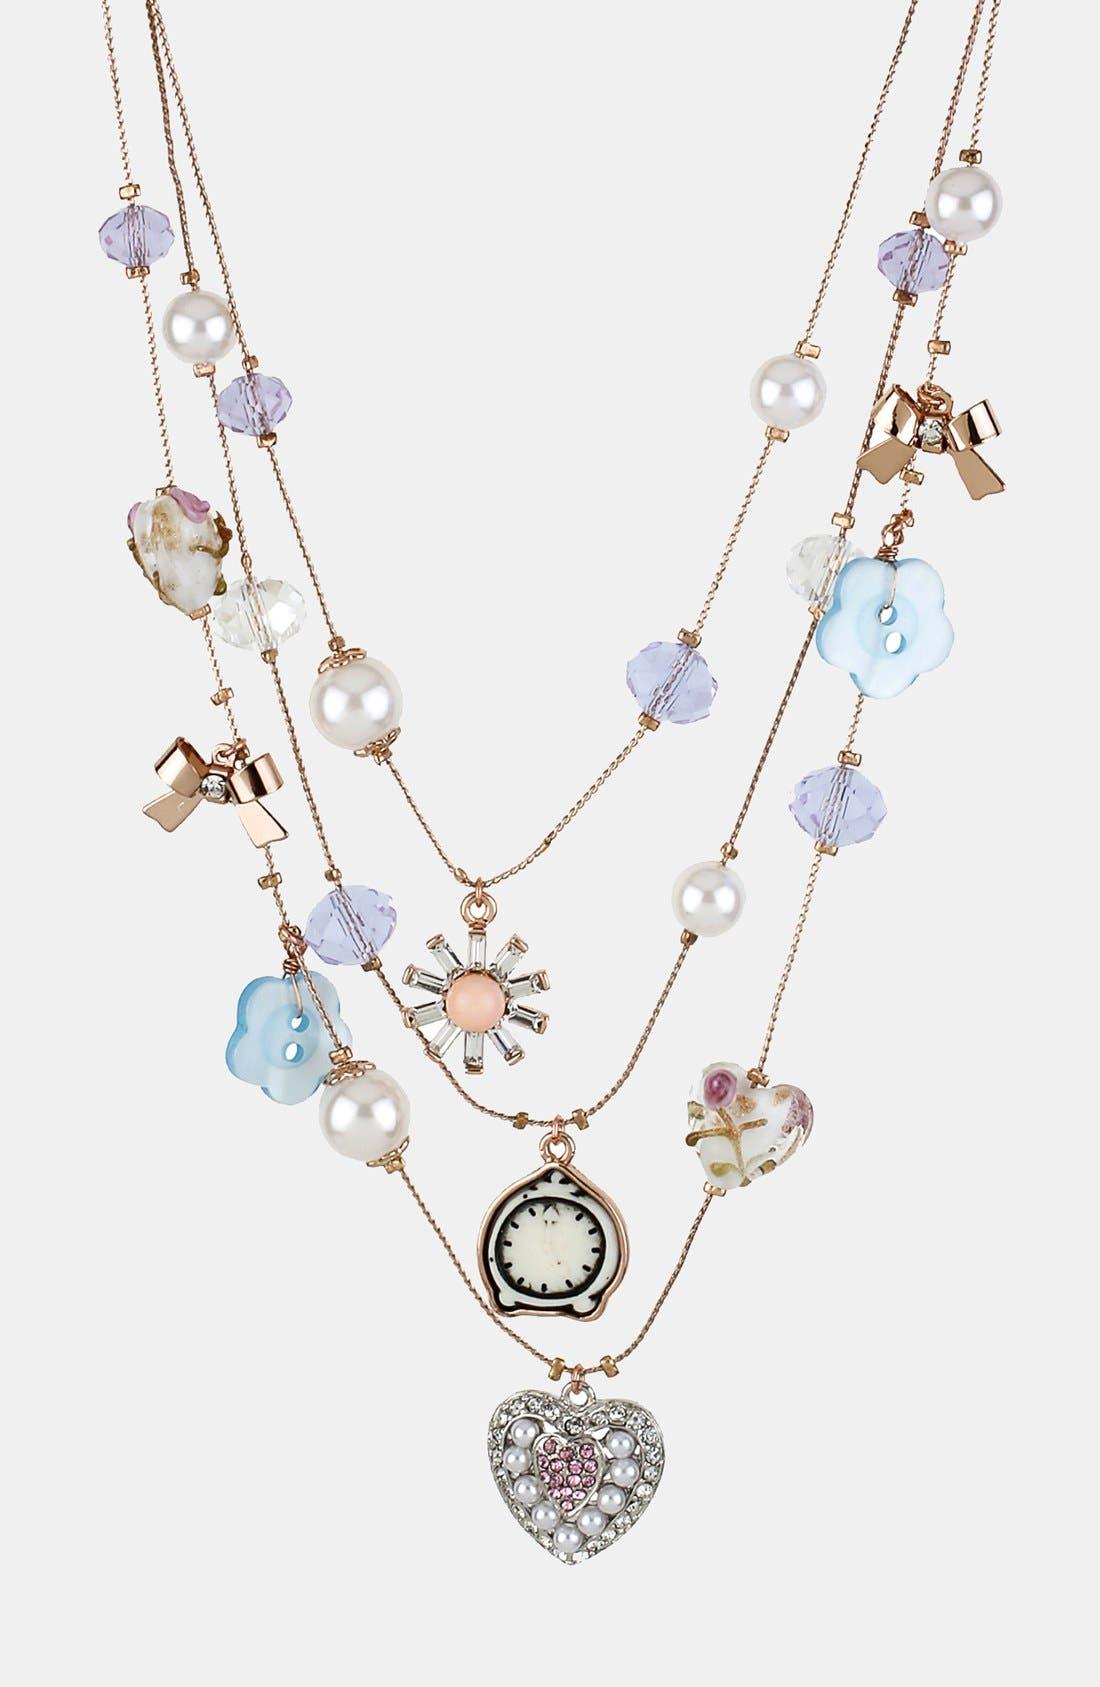 Alternate Image 1 Selected - Betsey Johnson 'Vintage Bow' Multistrand Necklace